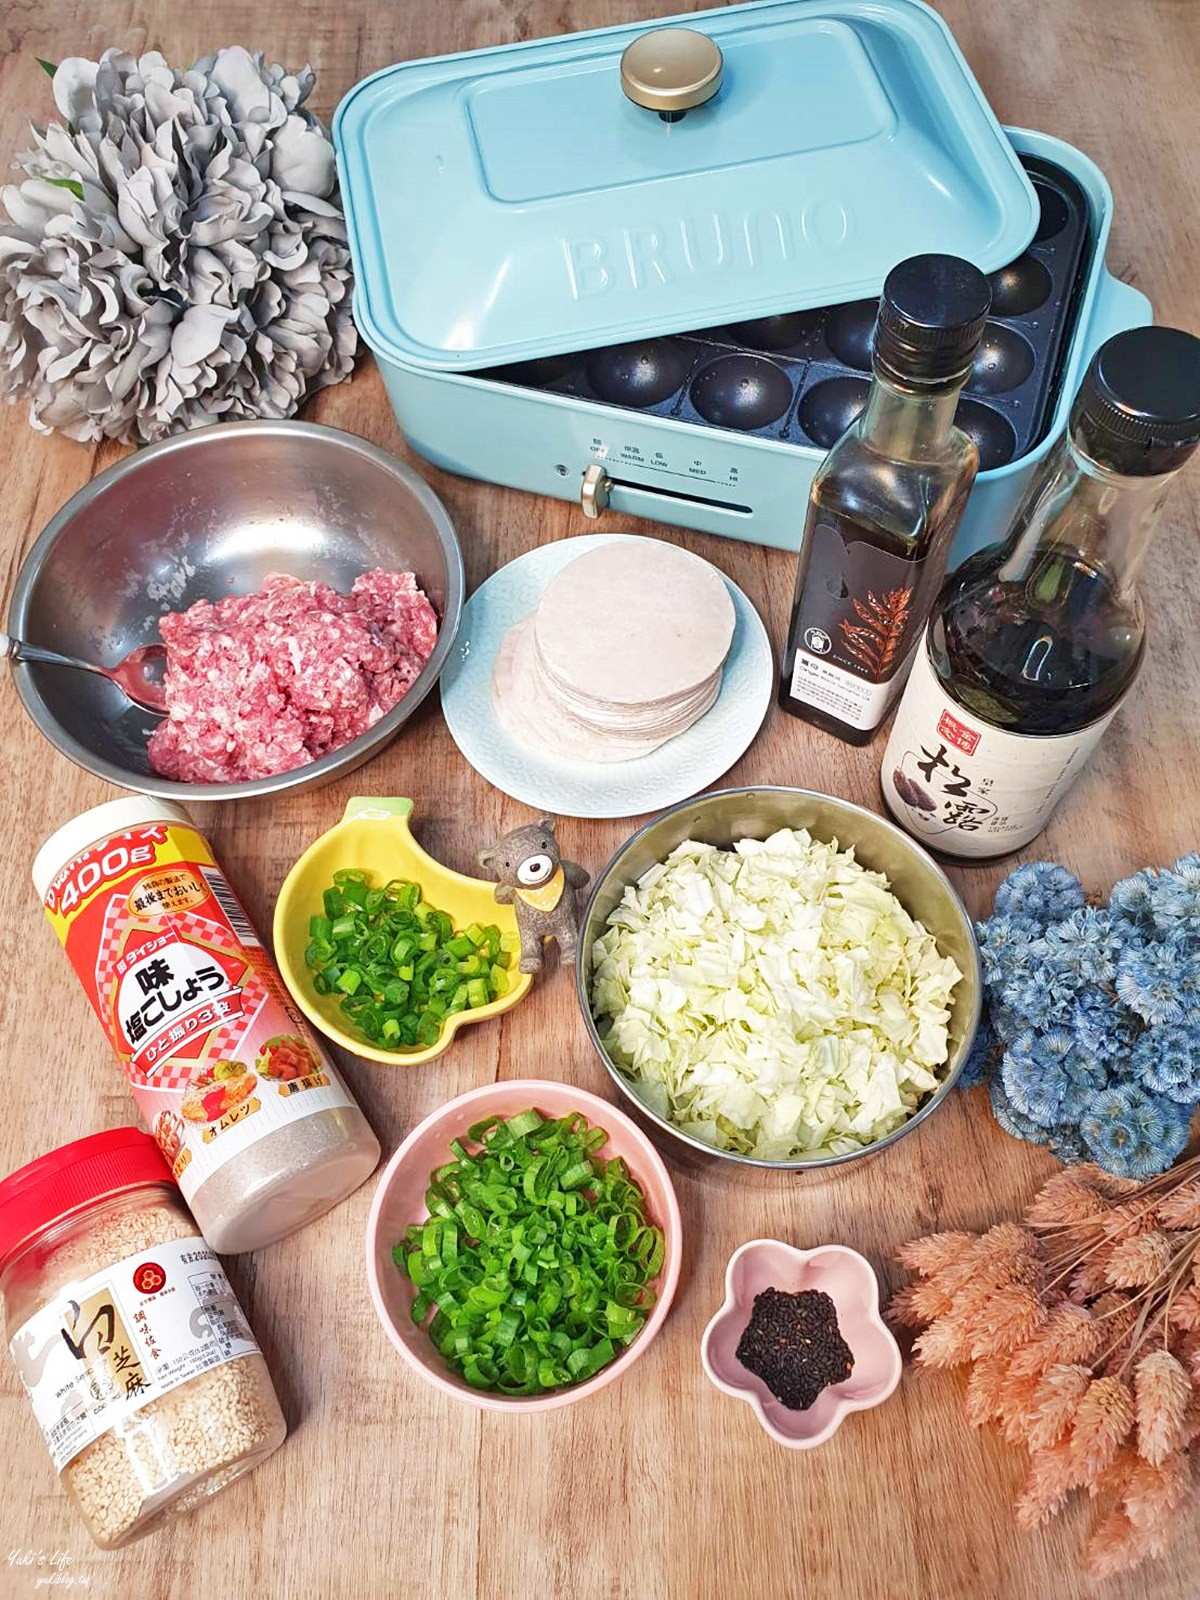 BRUNO電烤盤食譜》迷你水煎包~用水餃皮做水煎包簡單又好吃!香脆多汁一口接一口! - yukiblog.tw